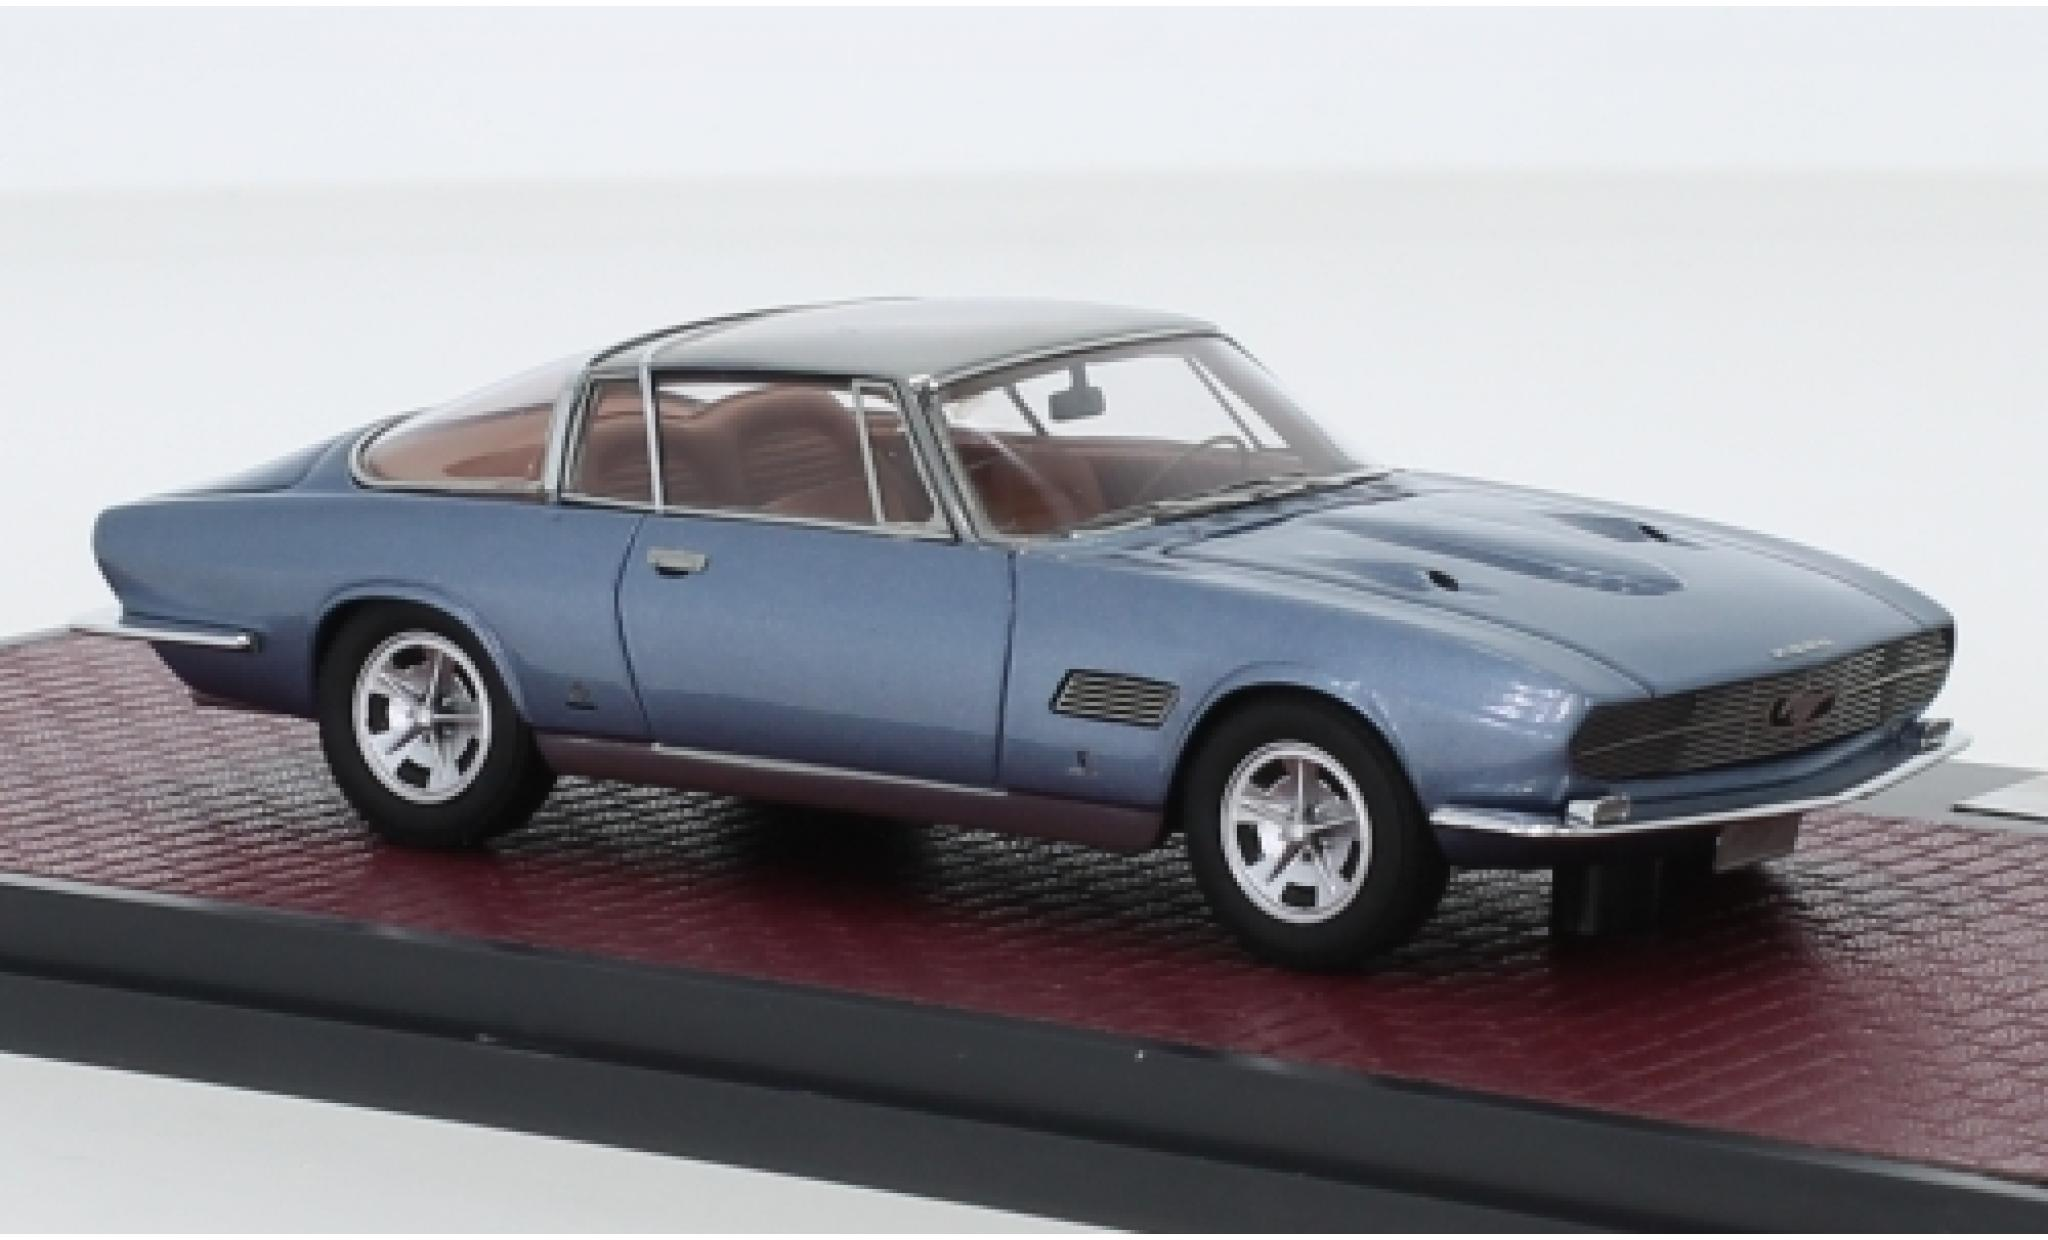 Ford Mustang 1/43 Matrix Bertone metallise bleue/grise 1965 Automobile Quarterly verdeckte Scheinwerfer